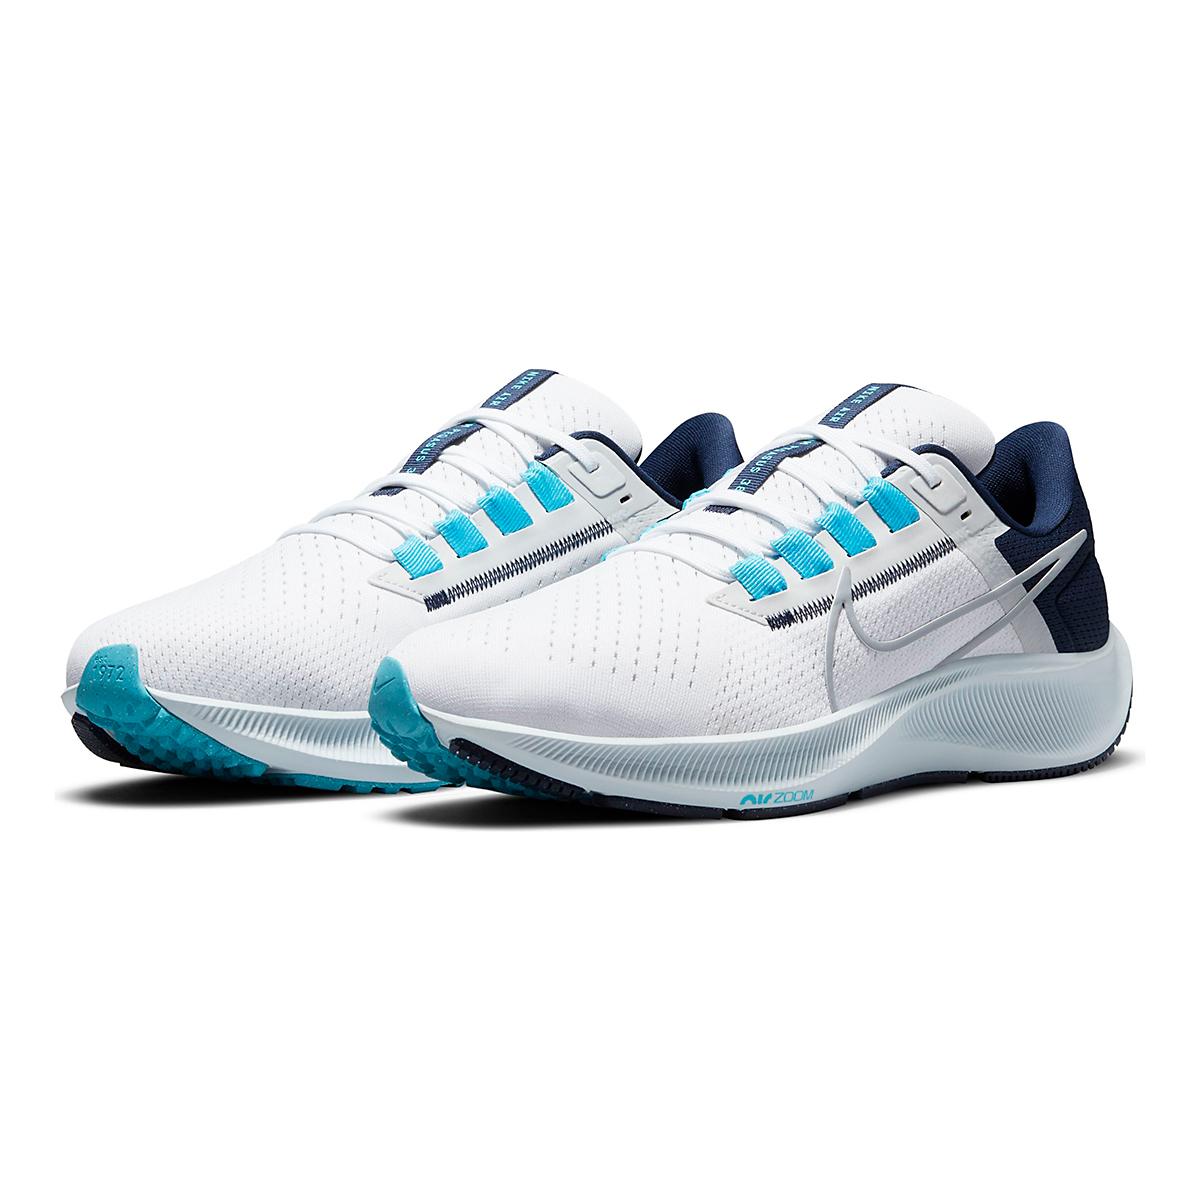 Men's Nike Air Zoom Pegasus 38 Running Shoe - Color: White/Wolf Grey/Pure Platinum - Size: 6 - Width: Regular, White/Wolf Grey/Pure Platinum, large, image 3